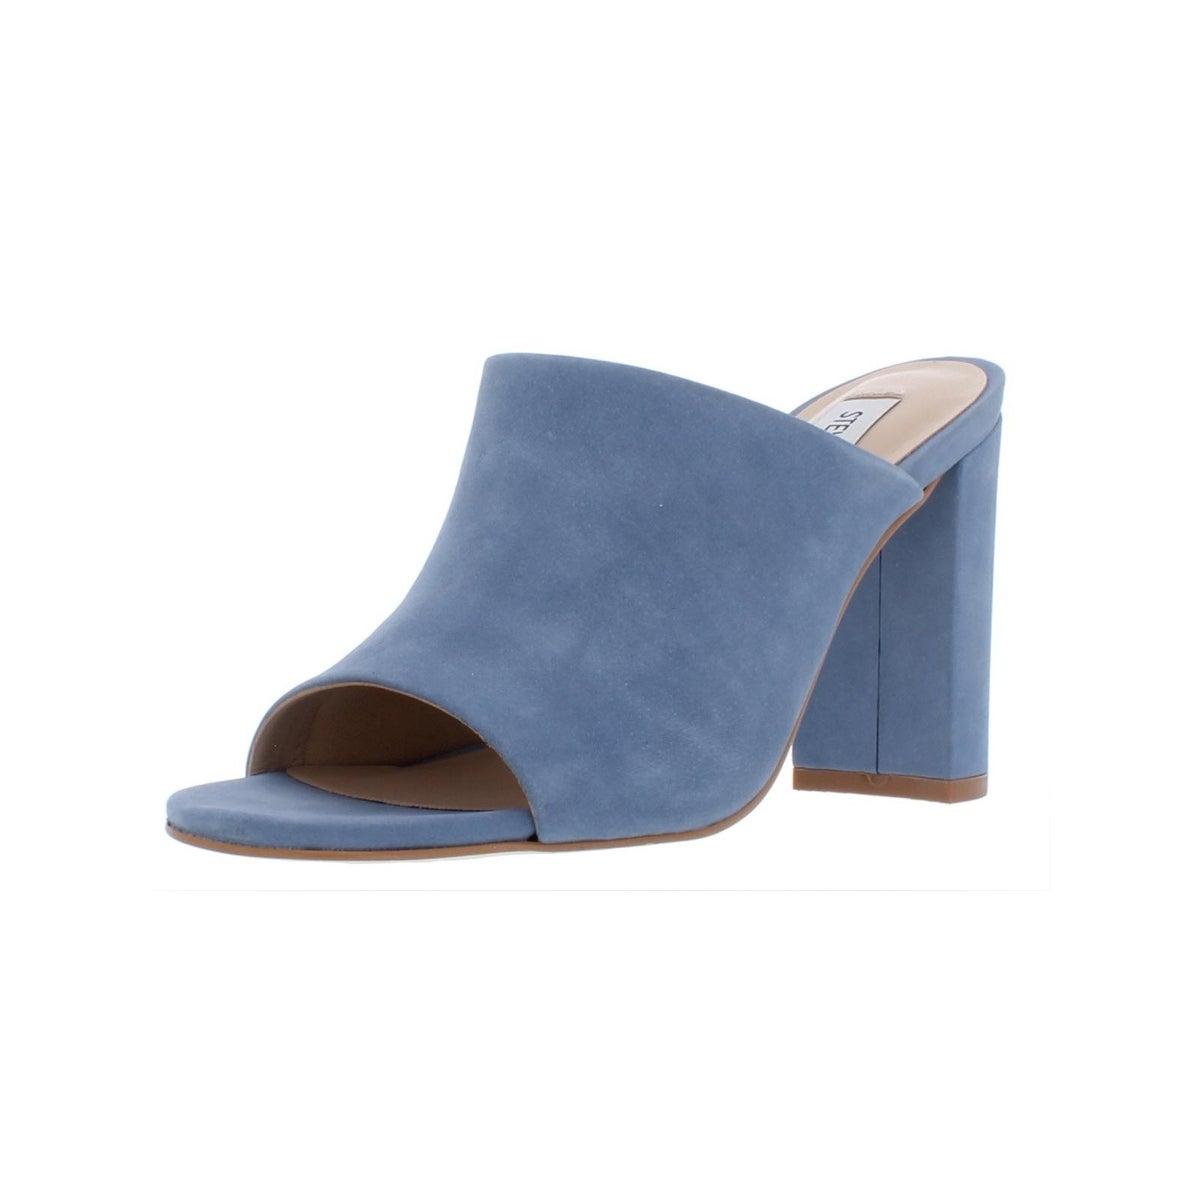 72fd099236b Steve Madden Womens Esmeralda Slide Sandals Nubuck Block Heel